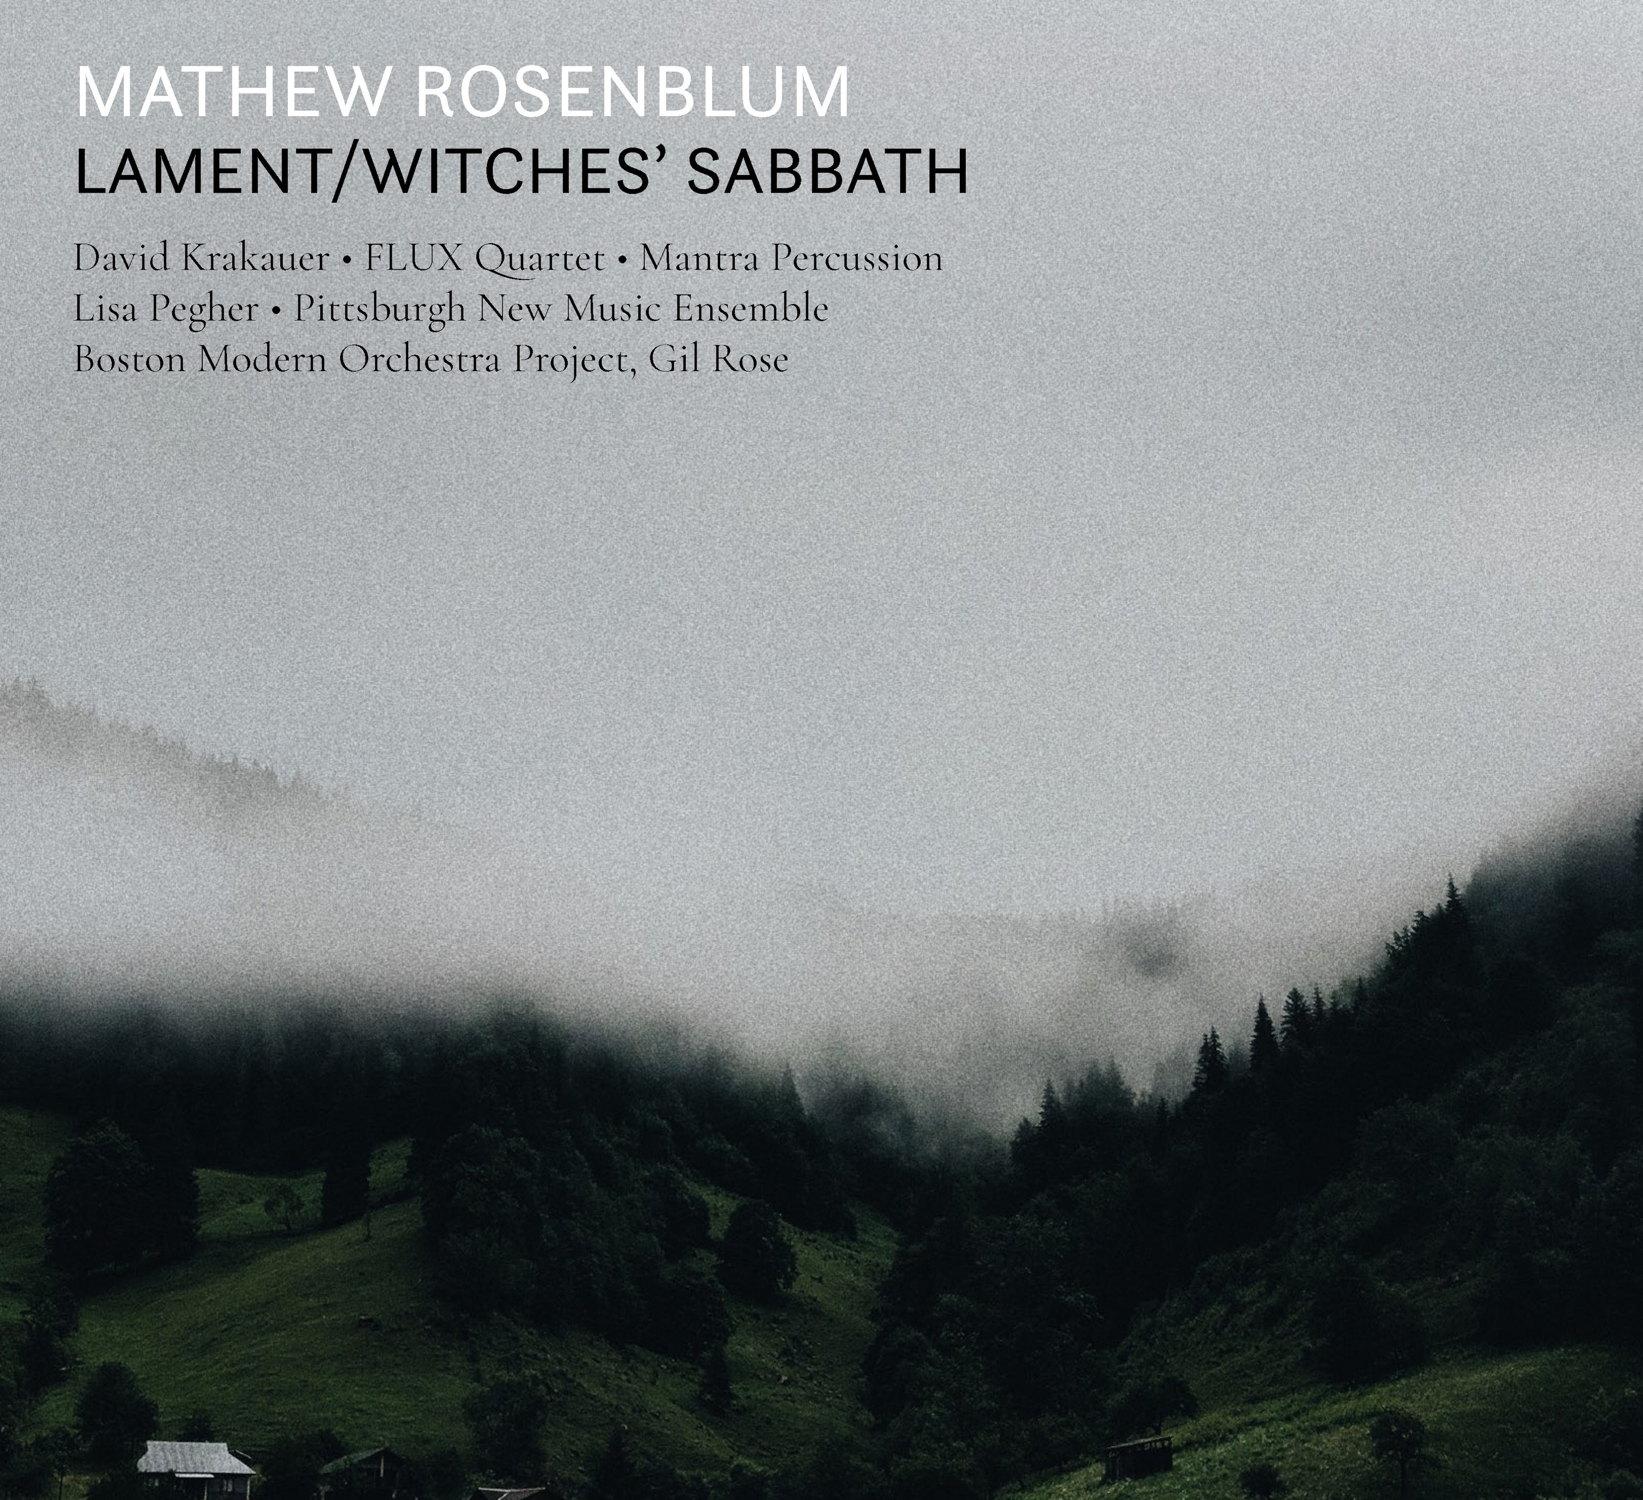 Mathew Rosenblum: Lament/Witches' Sabbath